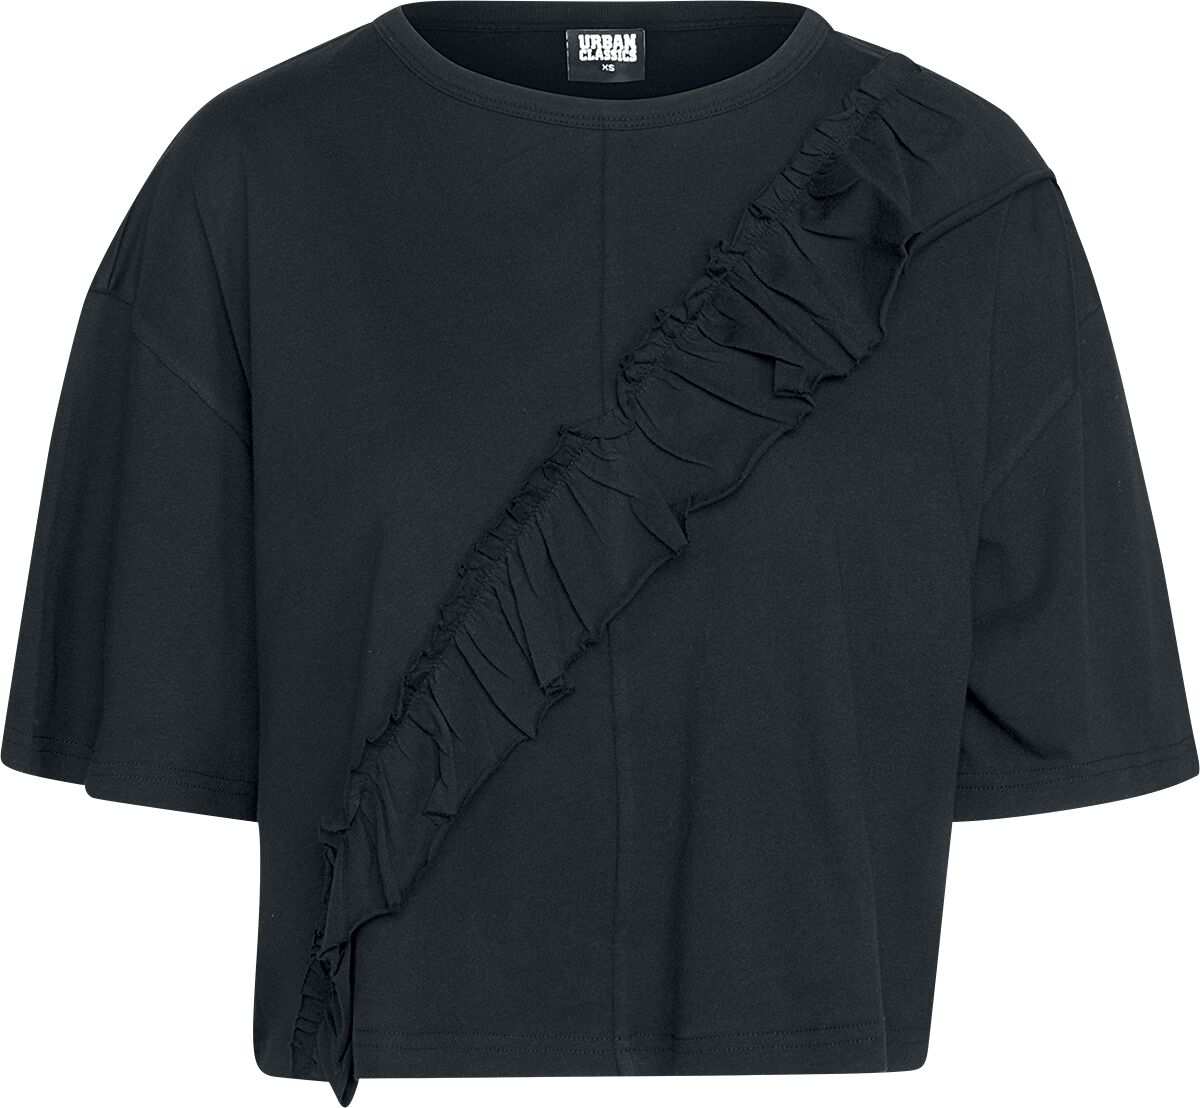 Urban Classics Ladies Short Oversize Volant Tee Koszulka damska czarny